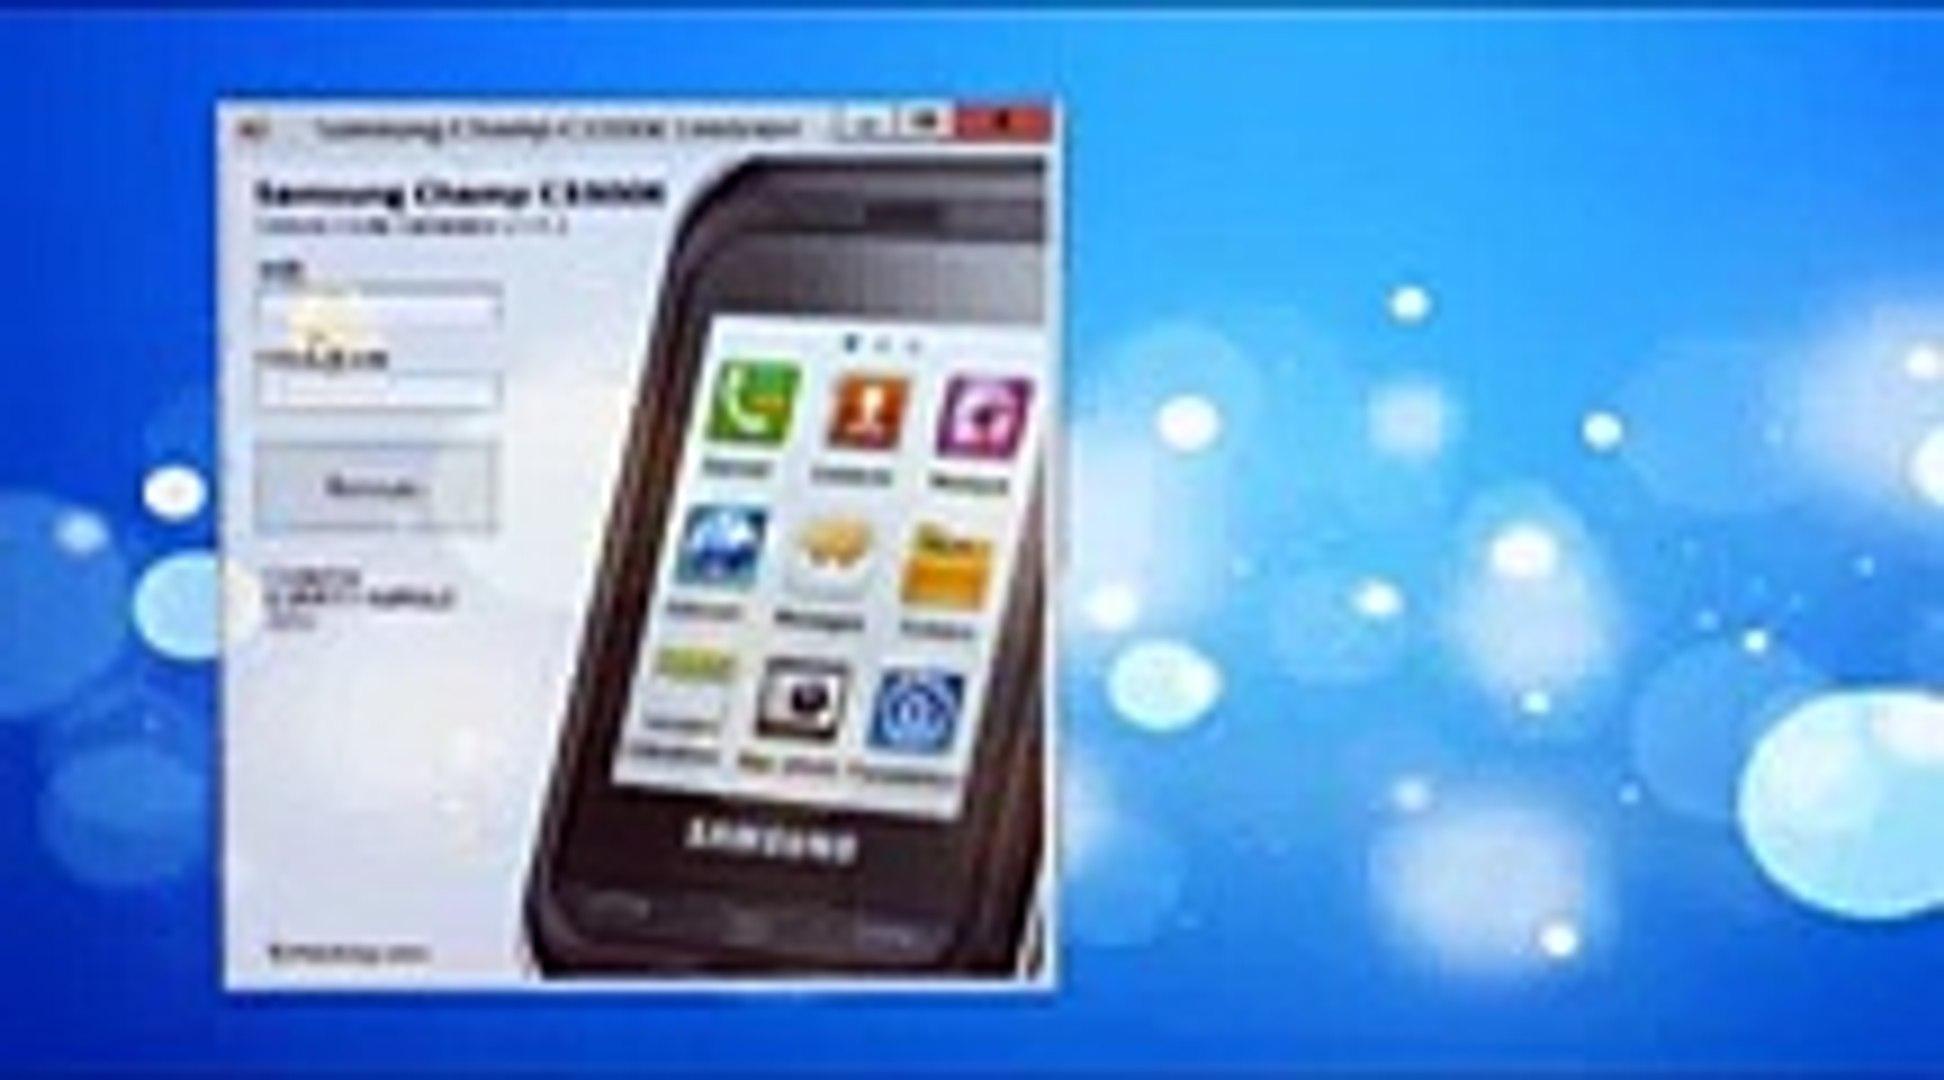 Samsung gt-c3300k network unlock code free online